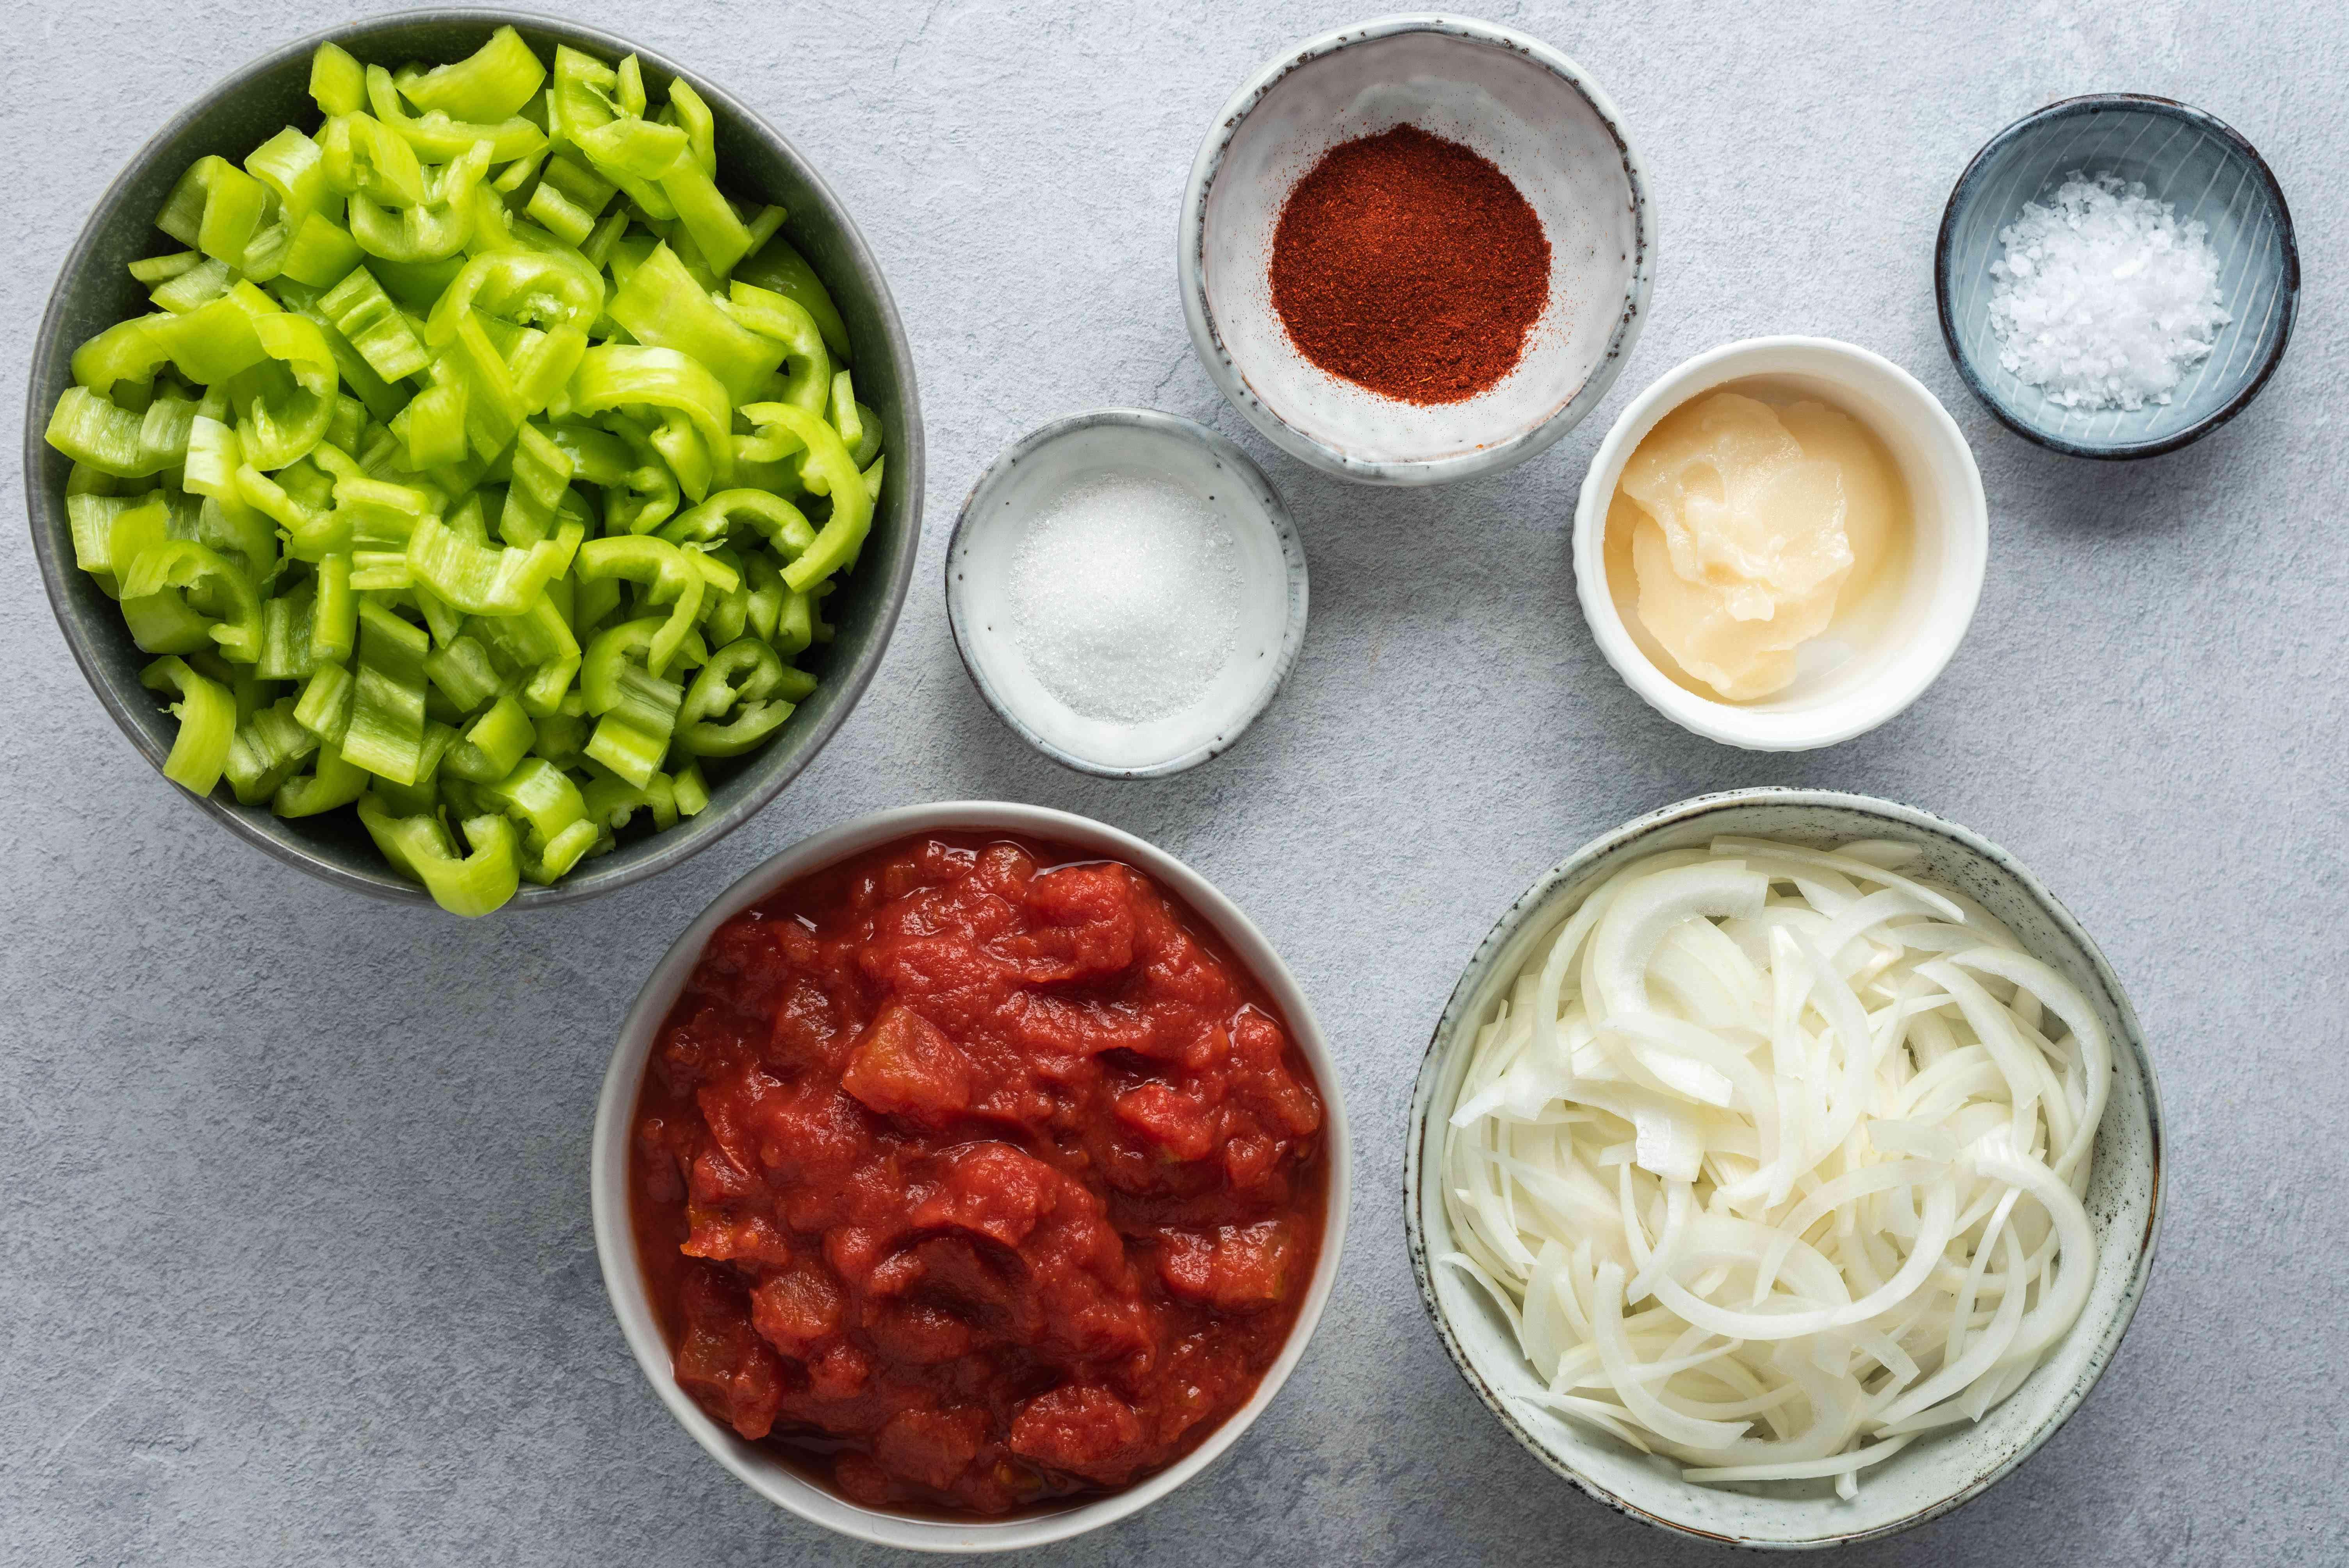 Hungarian tomato-pepper stew (lecsó) ingredients